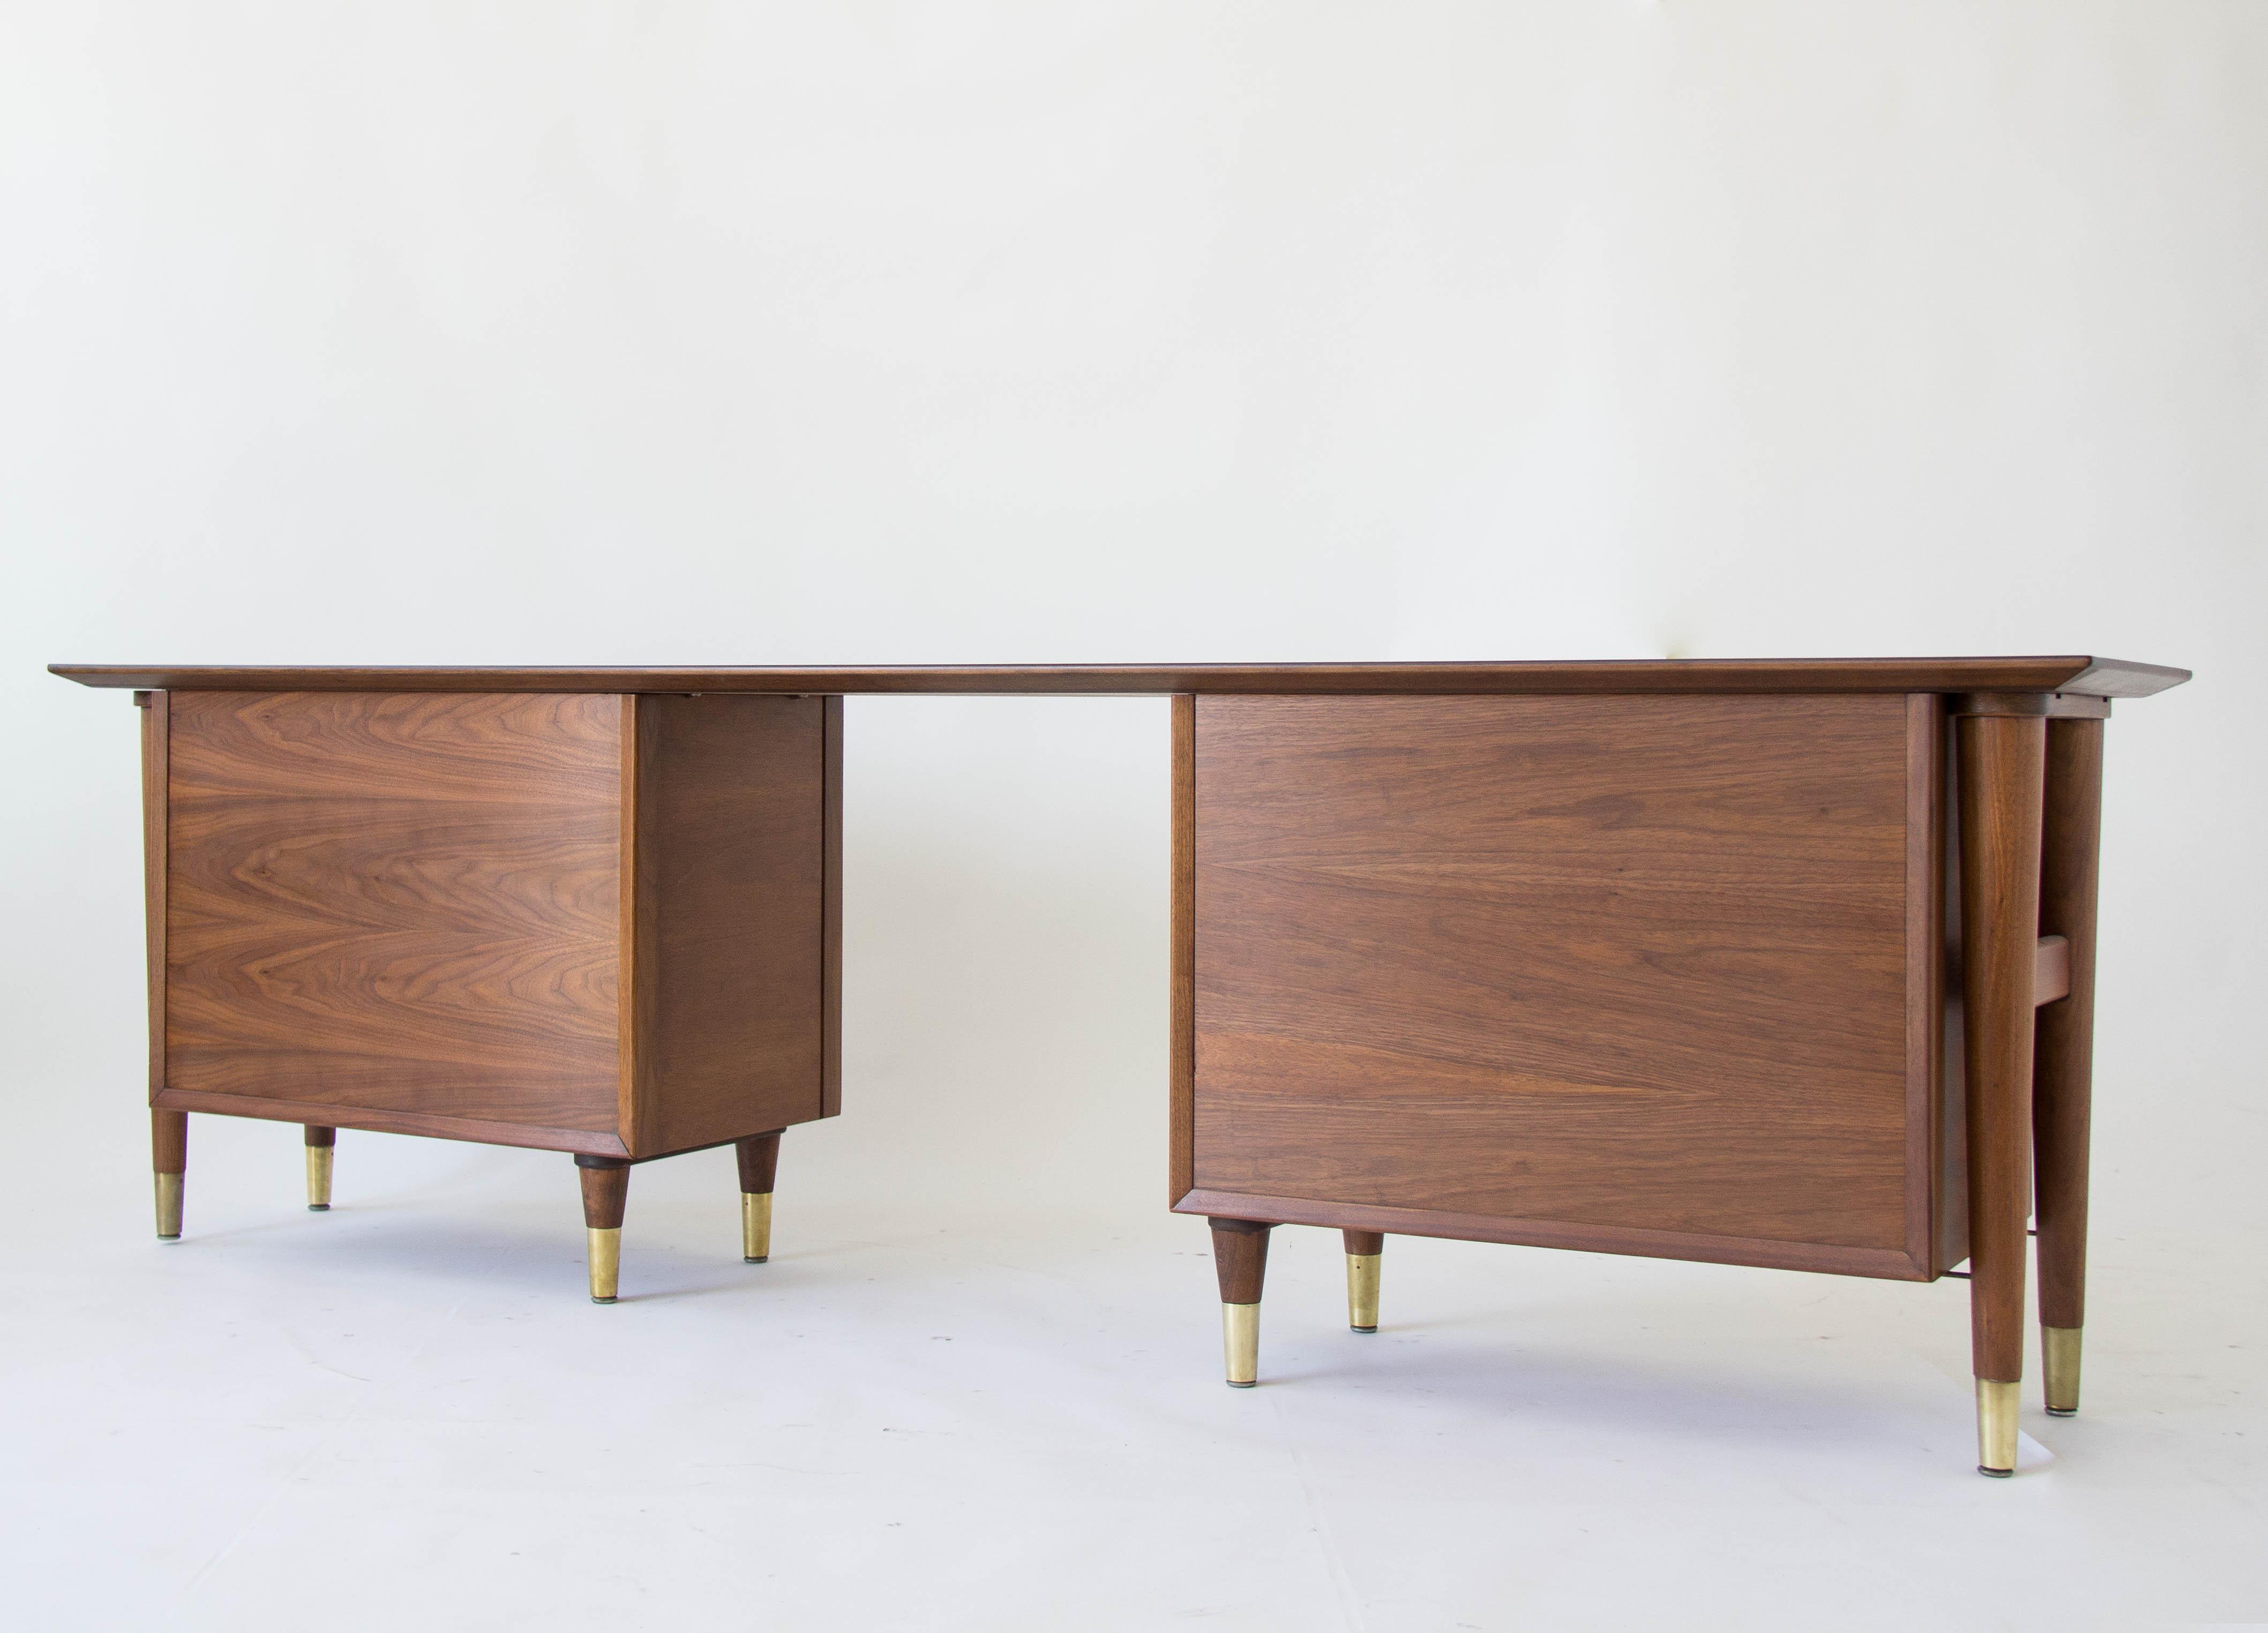 Standard Furniture Co Walnut & Brass Credenza